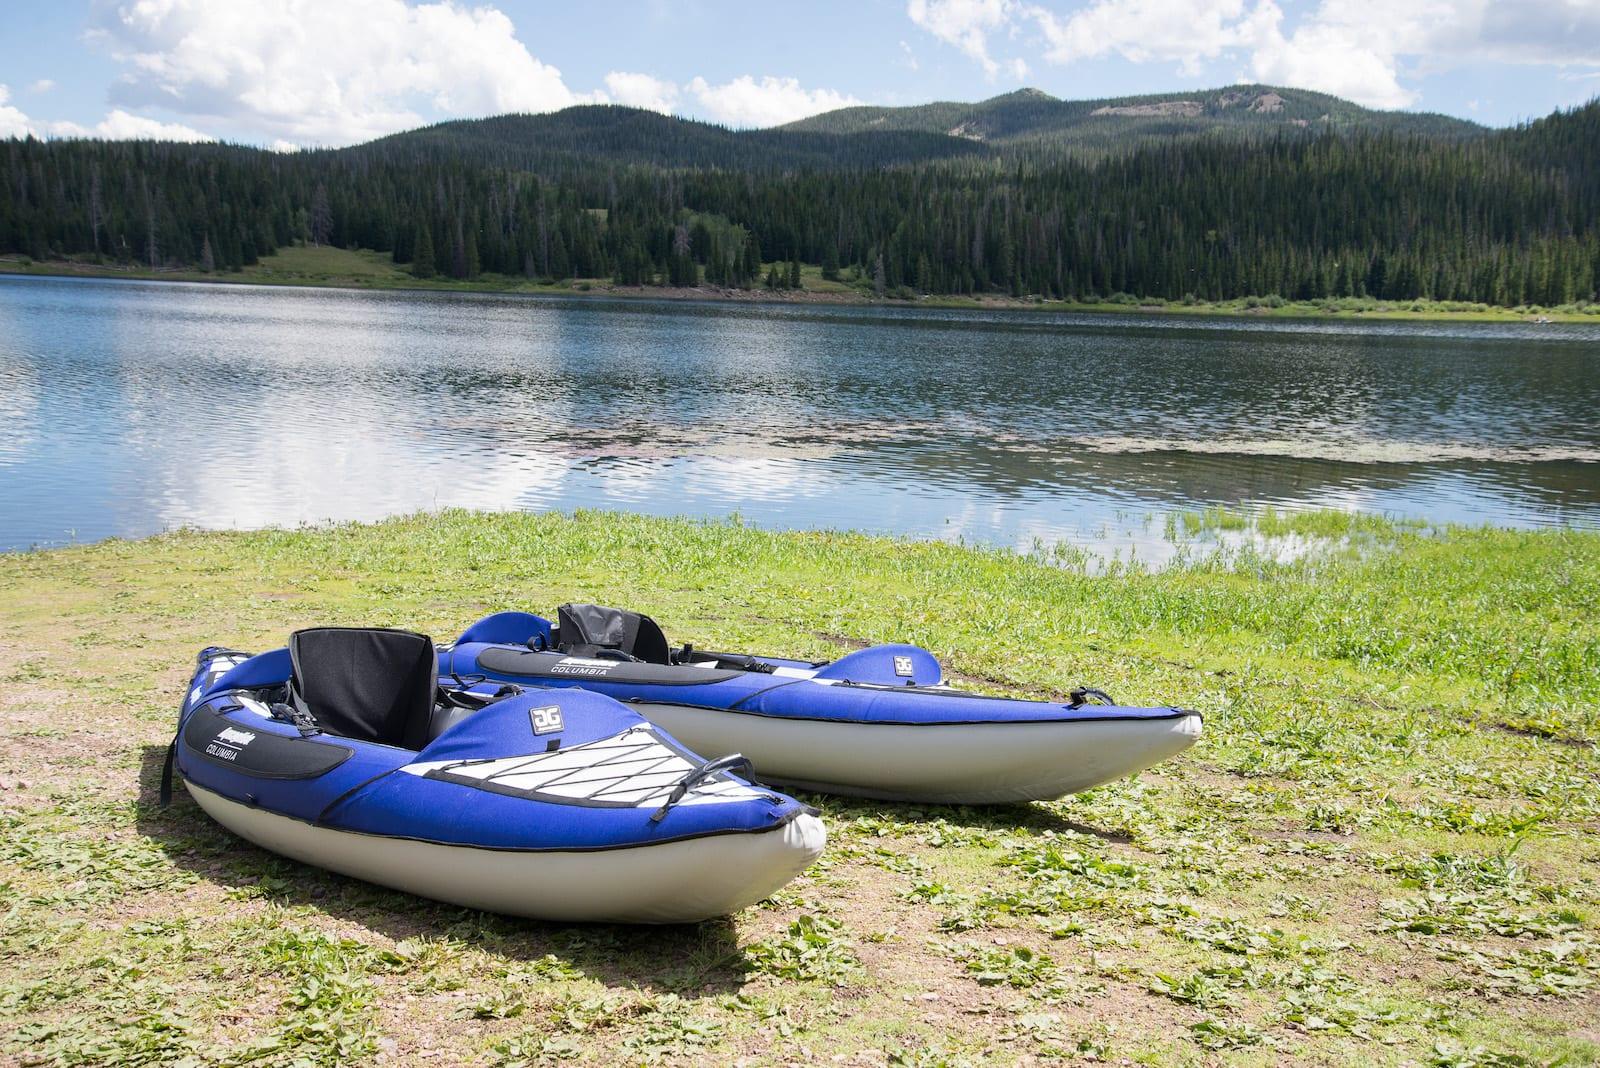 Kayking on Yamcolo Reservoir Colorado